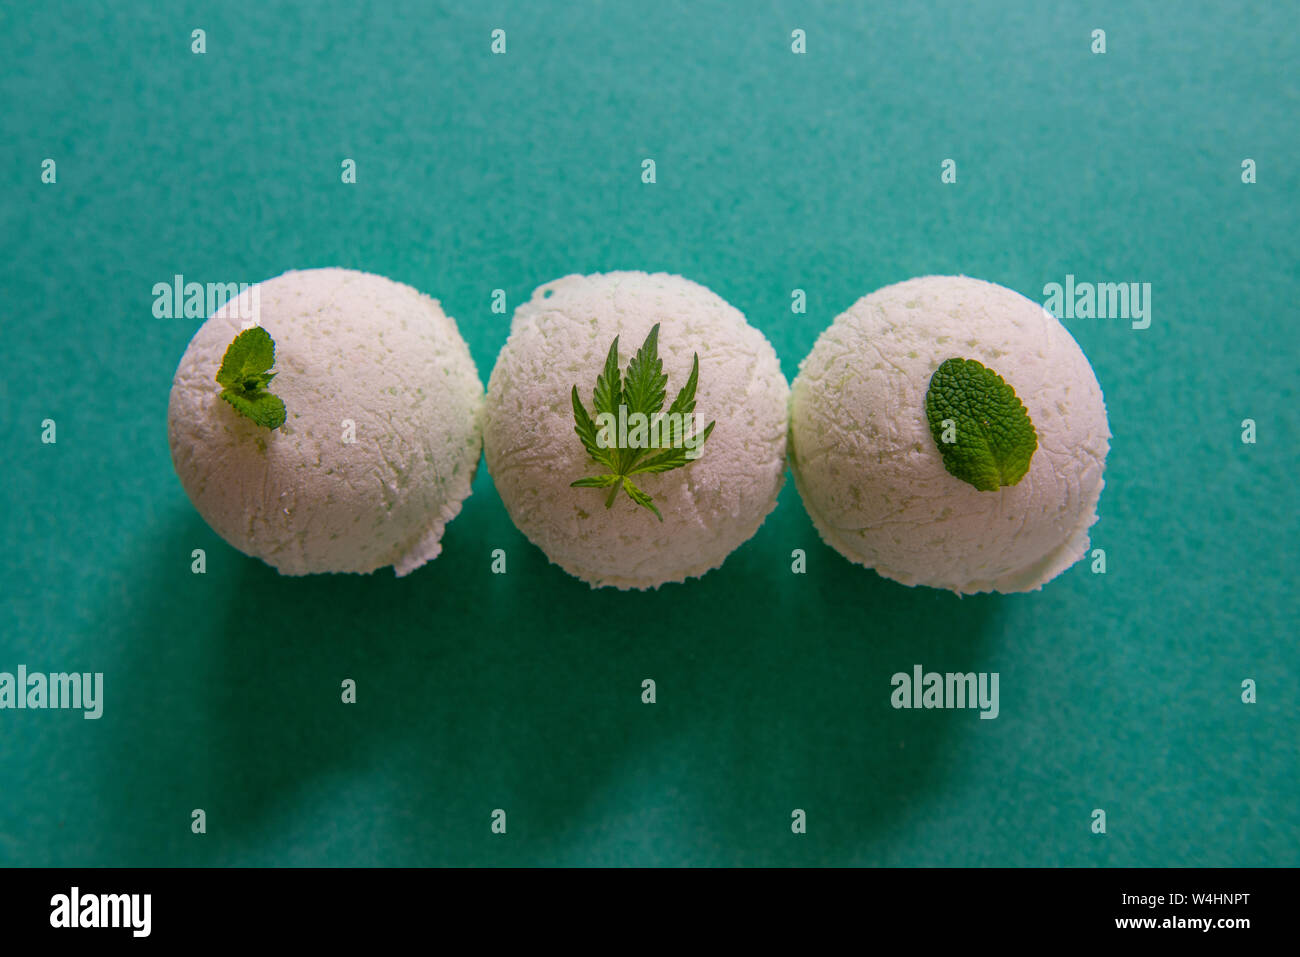 Cannabis wellness background with bath bombs, mint and marijuana leaf - cannabis spa concept Stock Photo